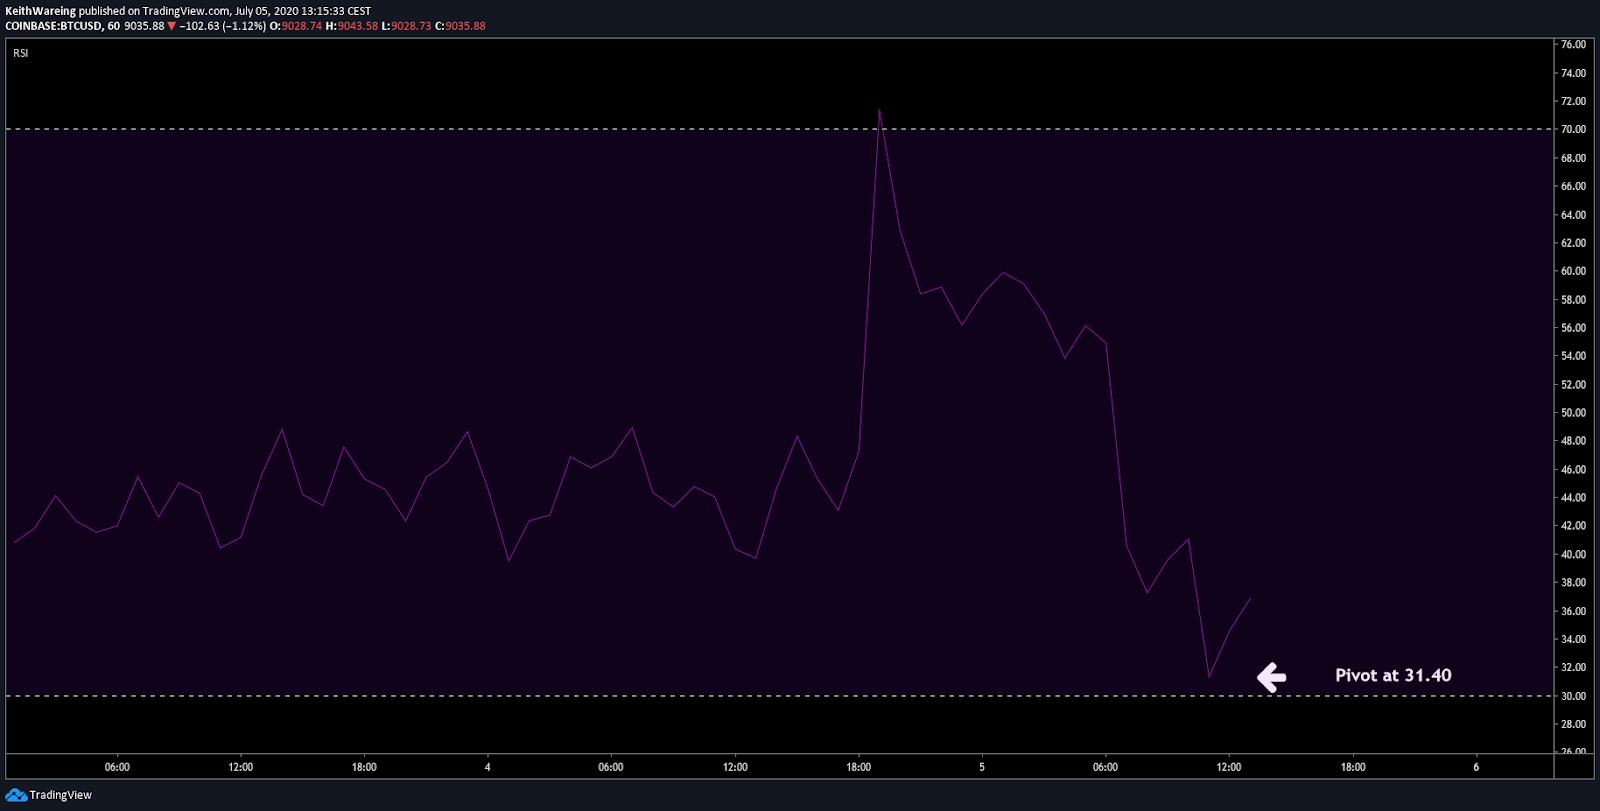 BTC/USD 1-hour RSI chart